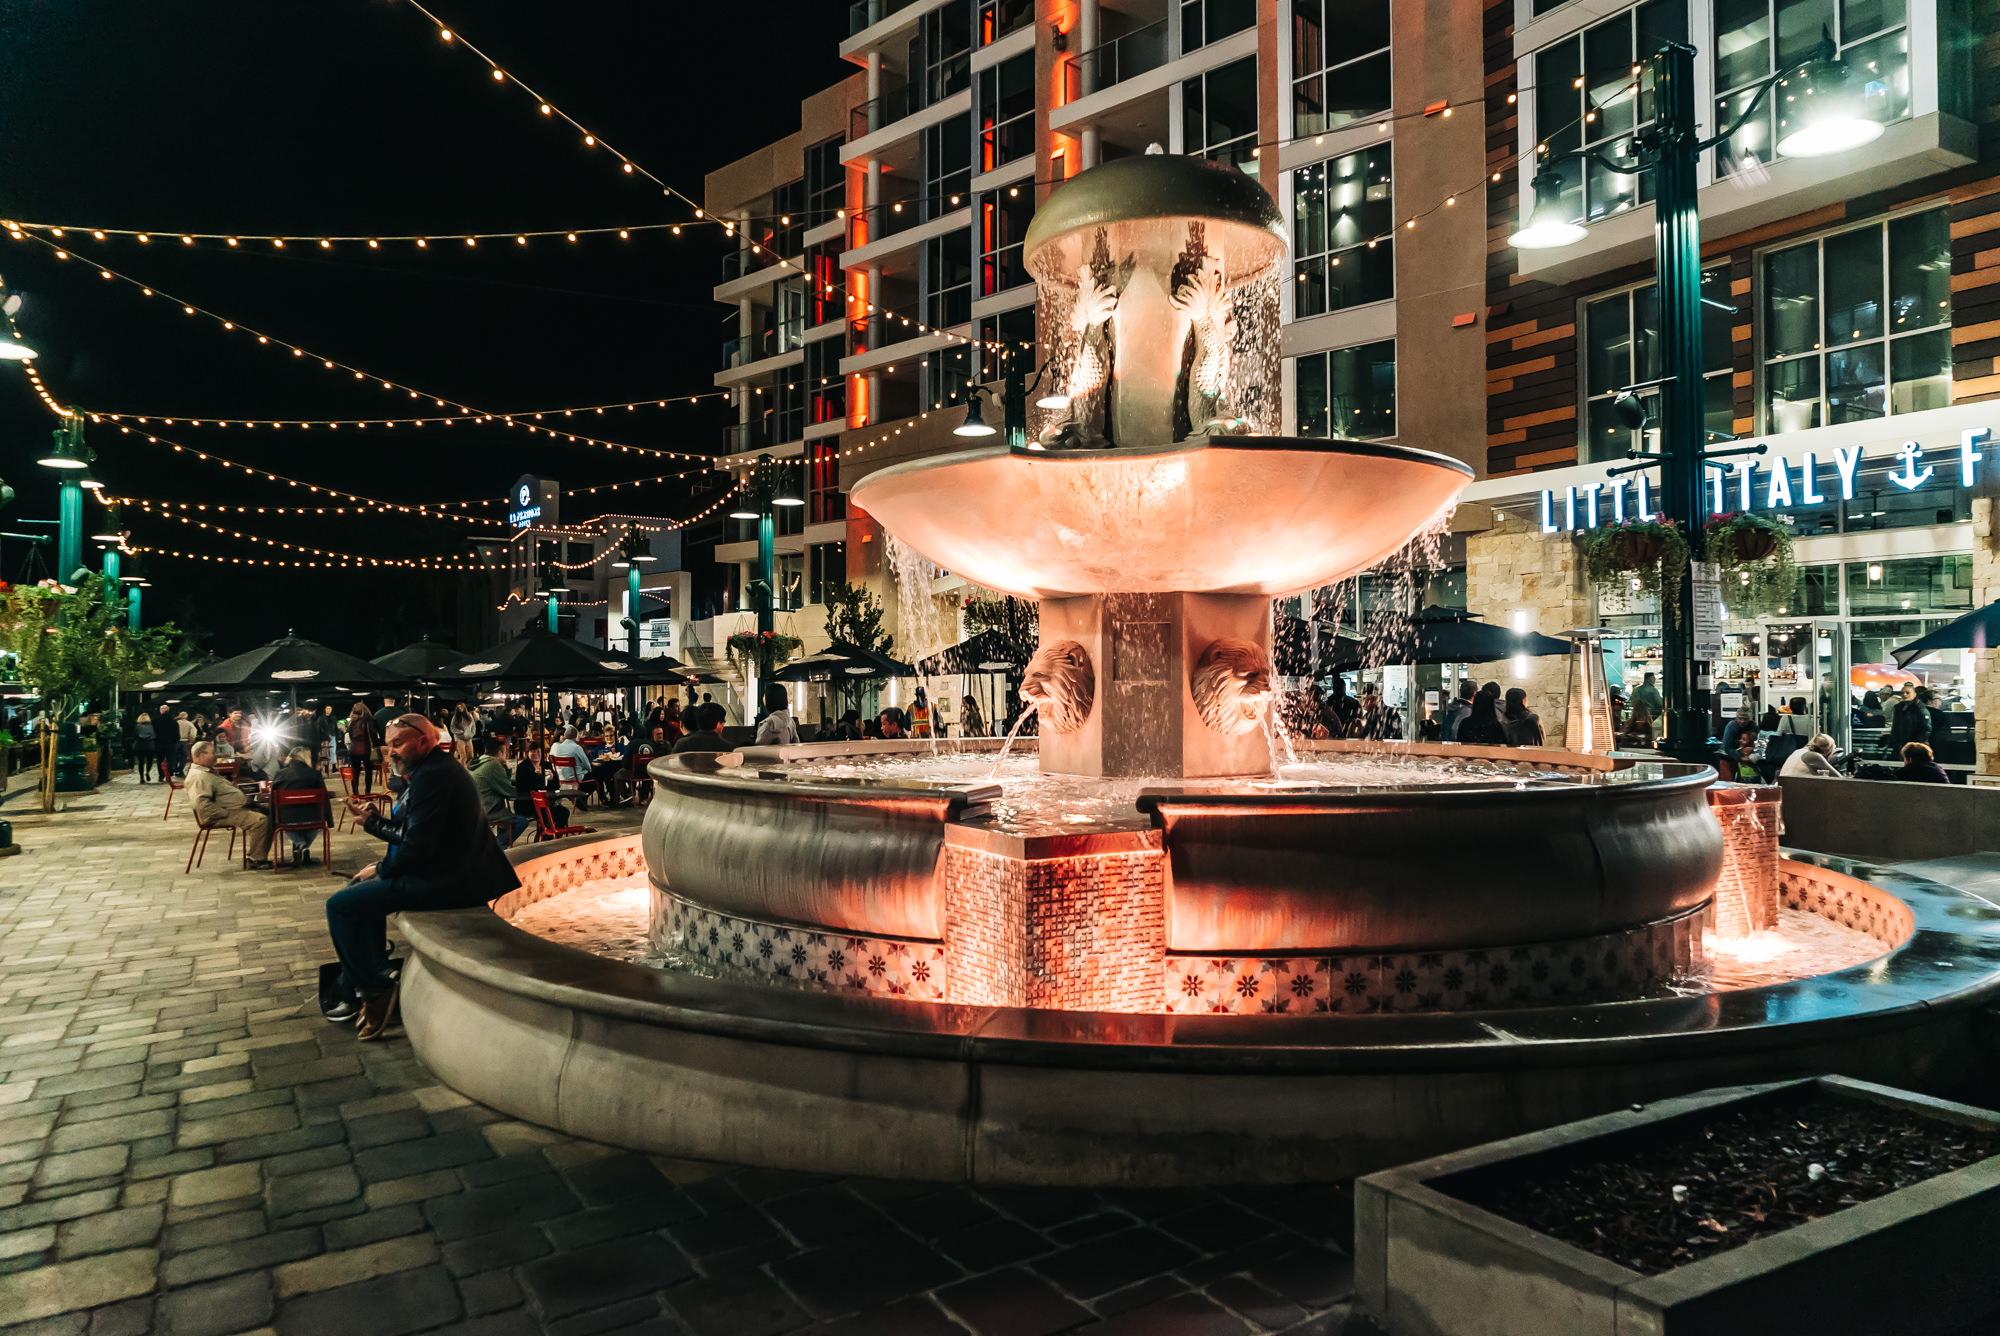 Piazza delia Famiglia Little Italy San Diego #LittleItalySD